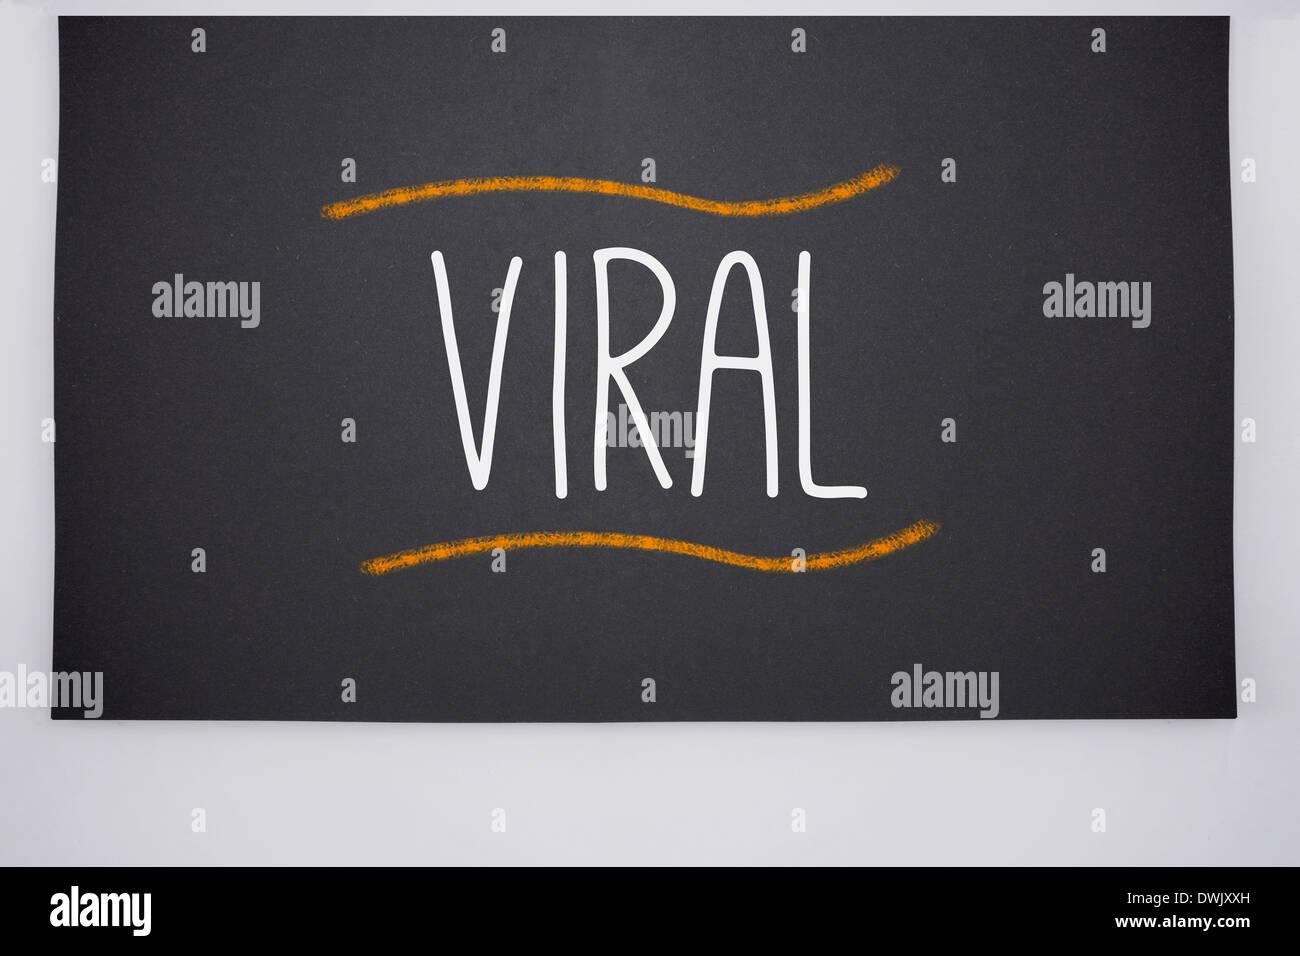 Viral written on big blackboard - Stock Image